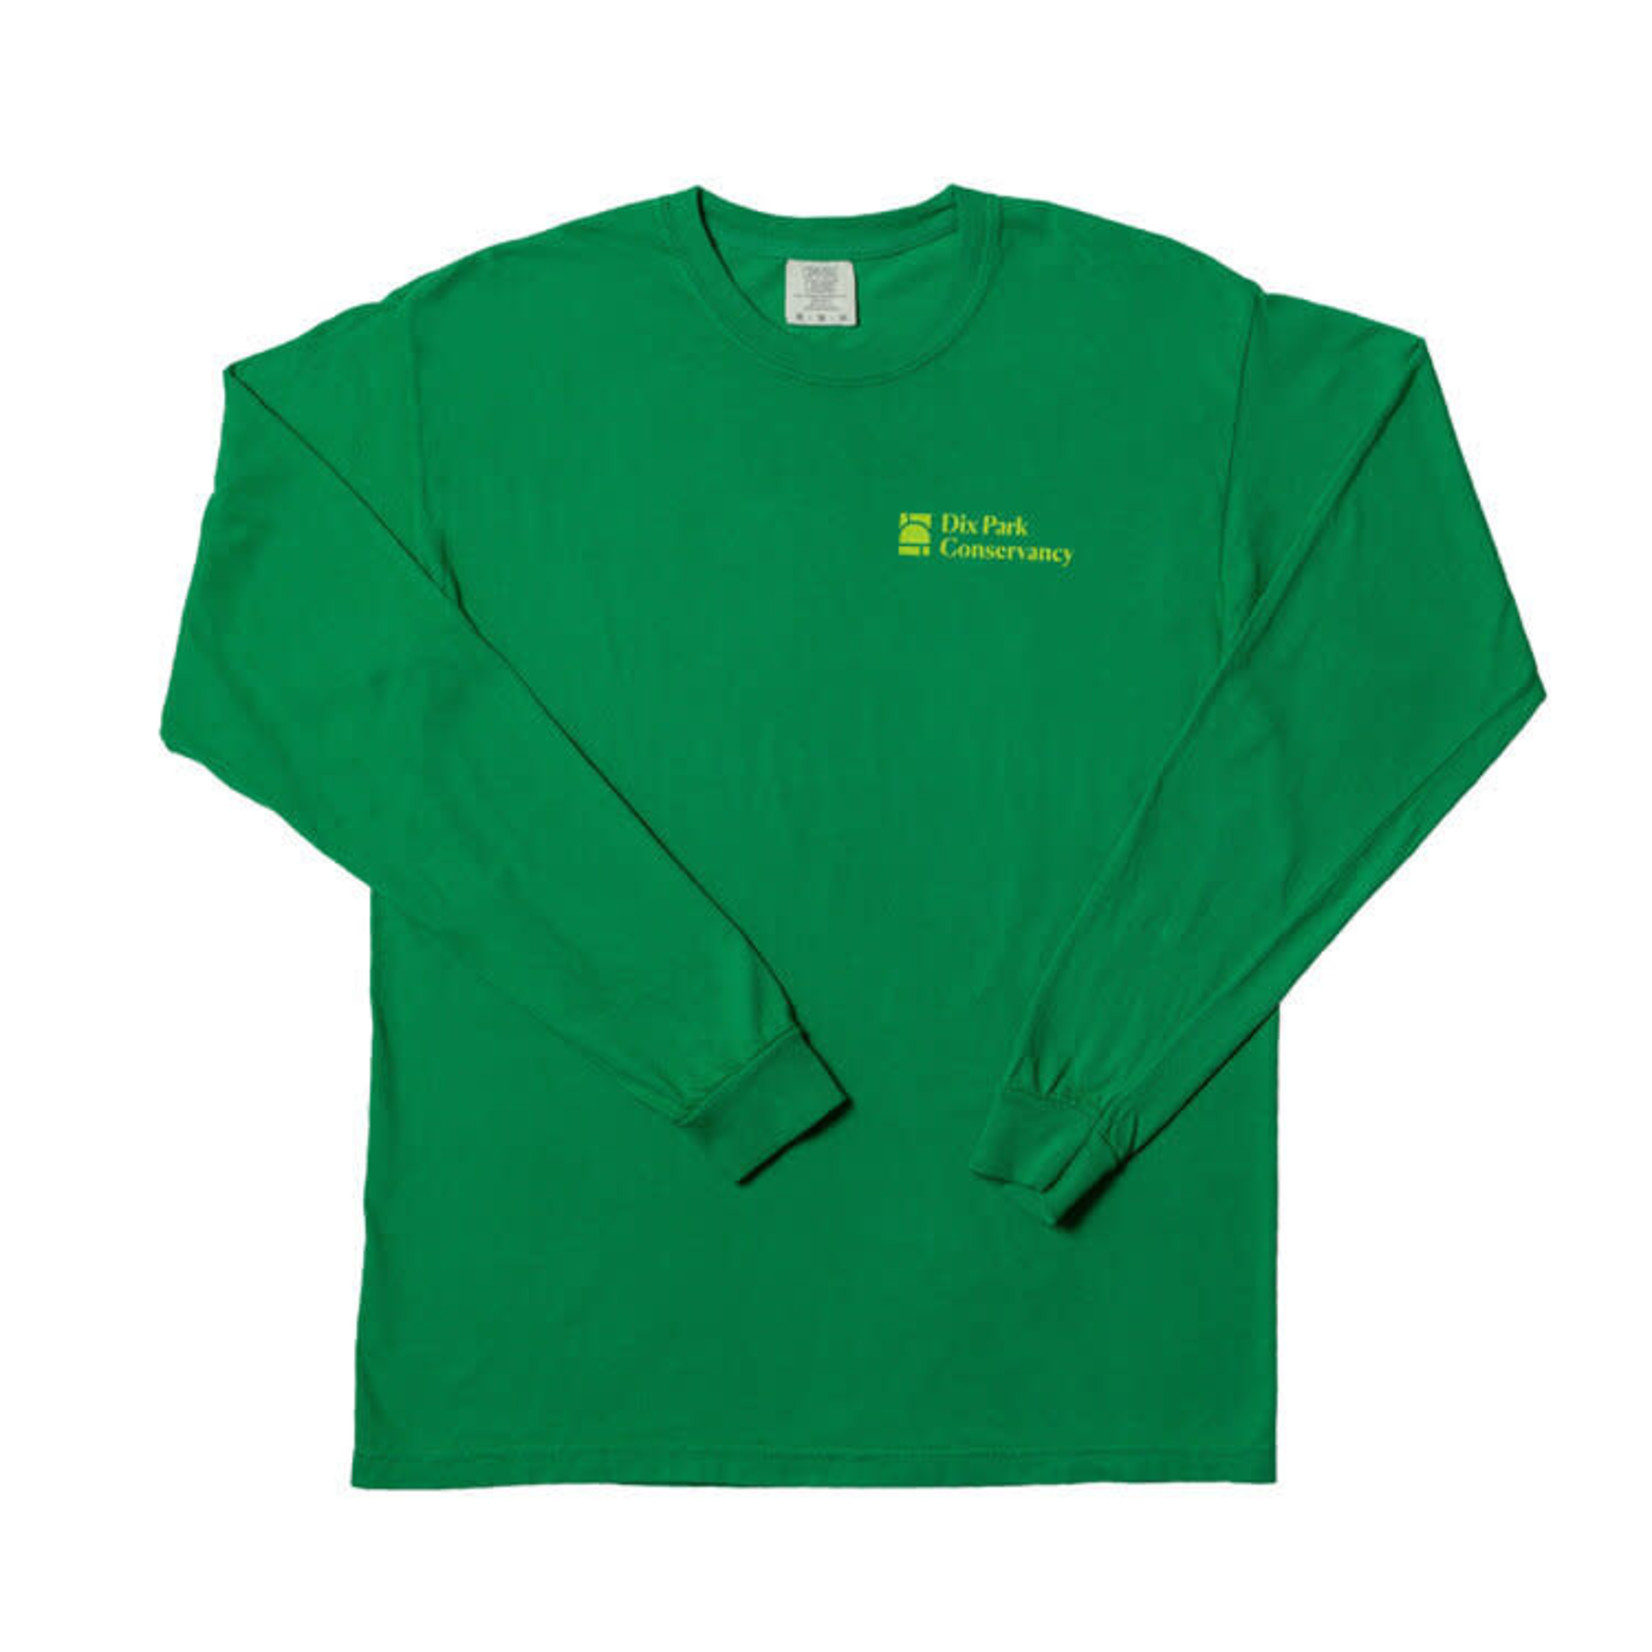 Dix Park Conservancy Dix Park Long-Sleeved Tshirt